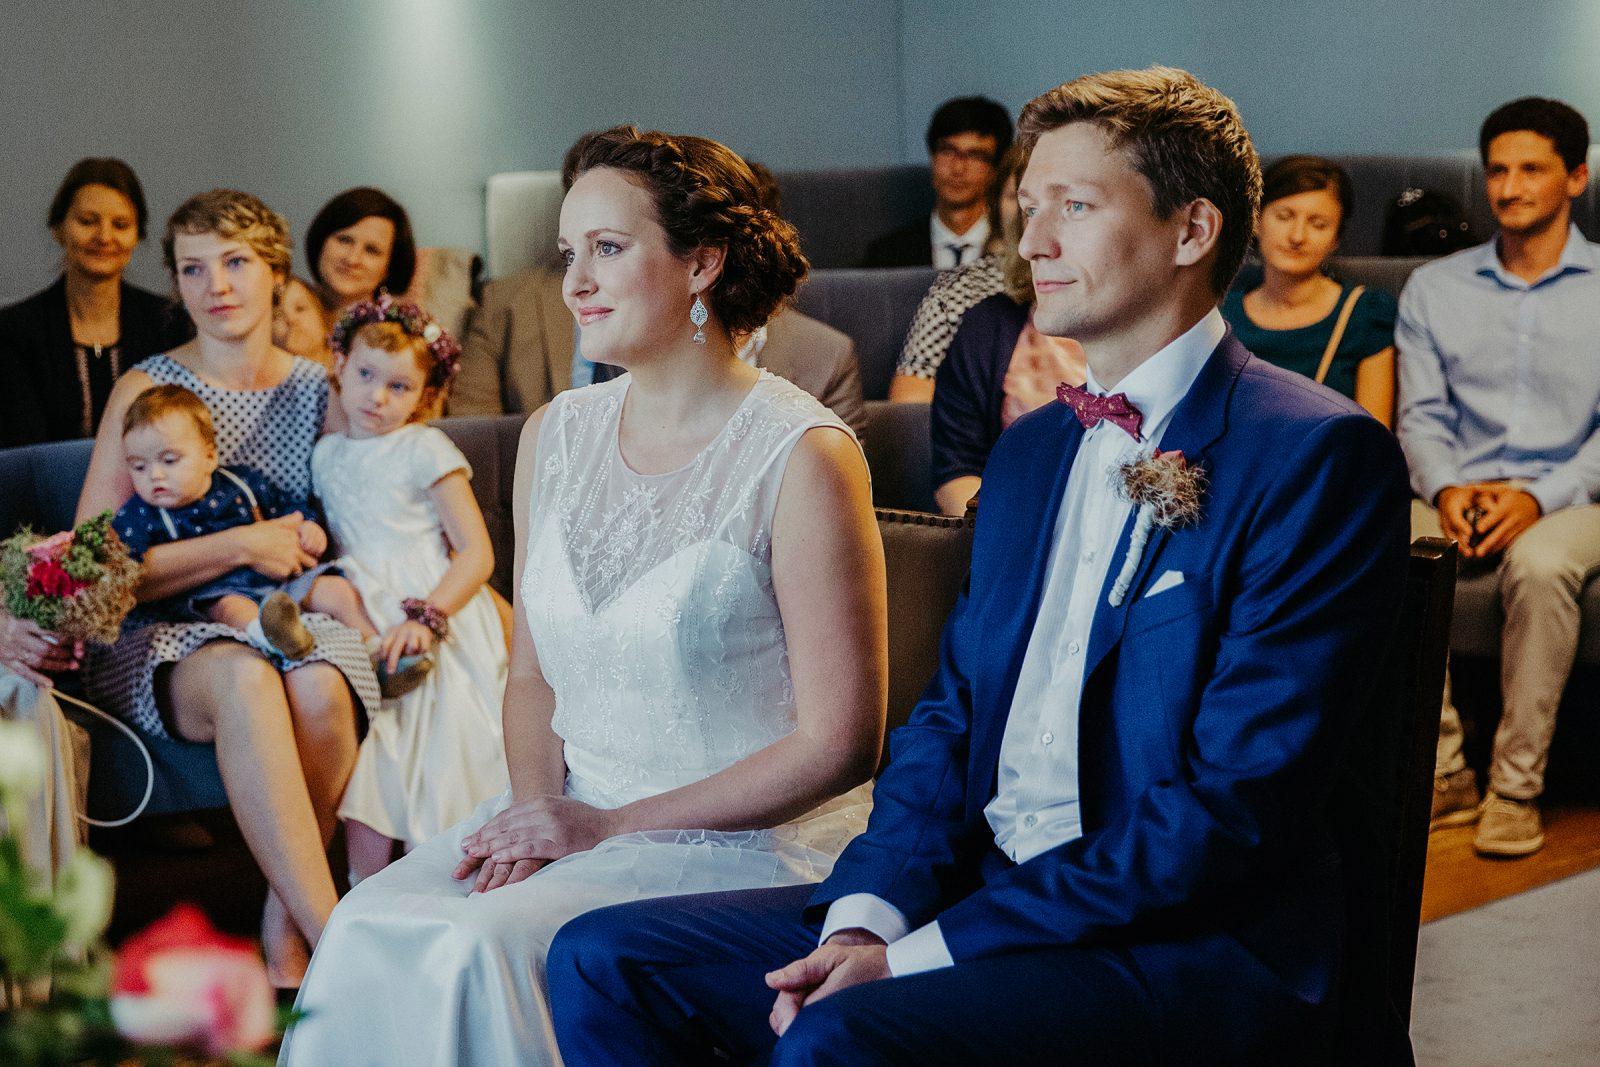 Hochzeit_Potsdam_fotograf_G6